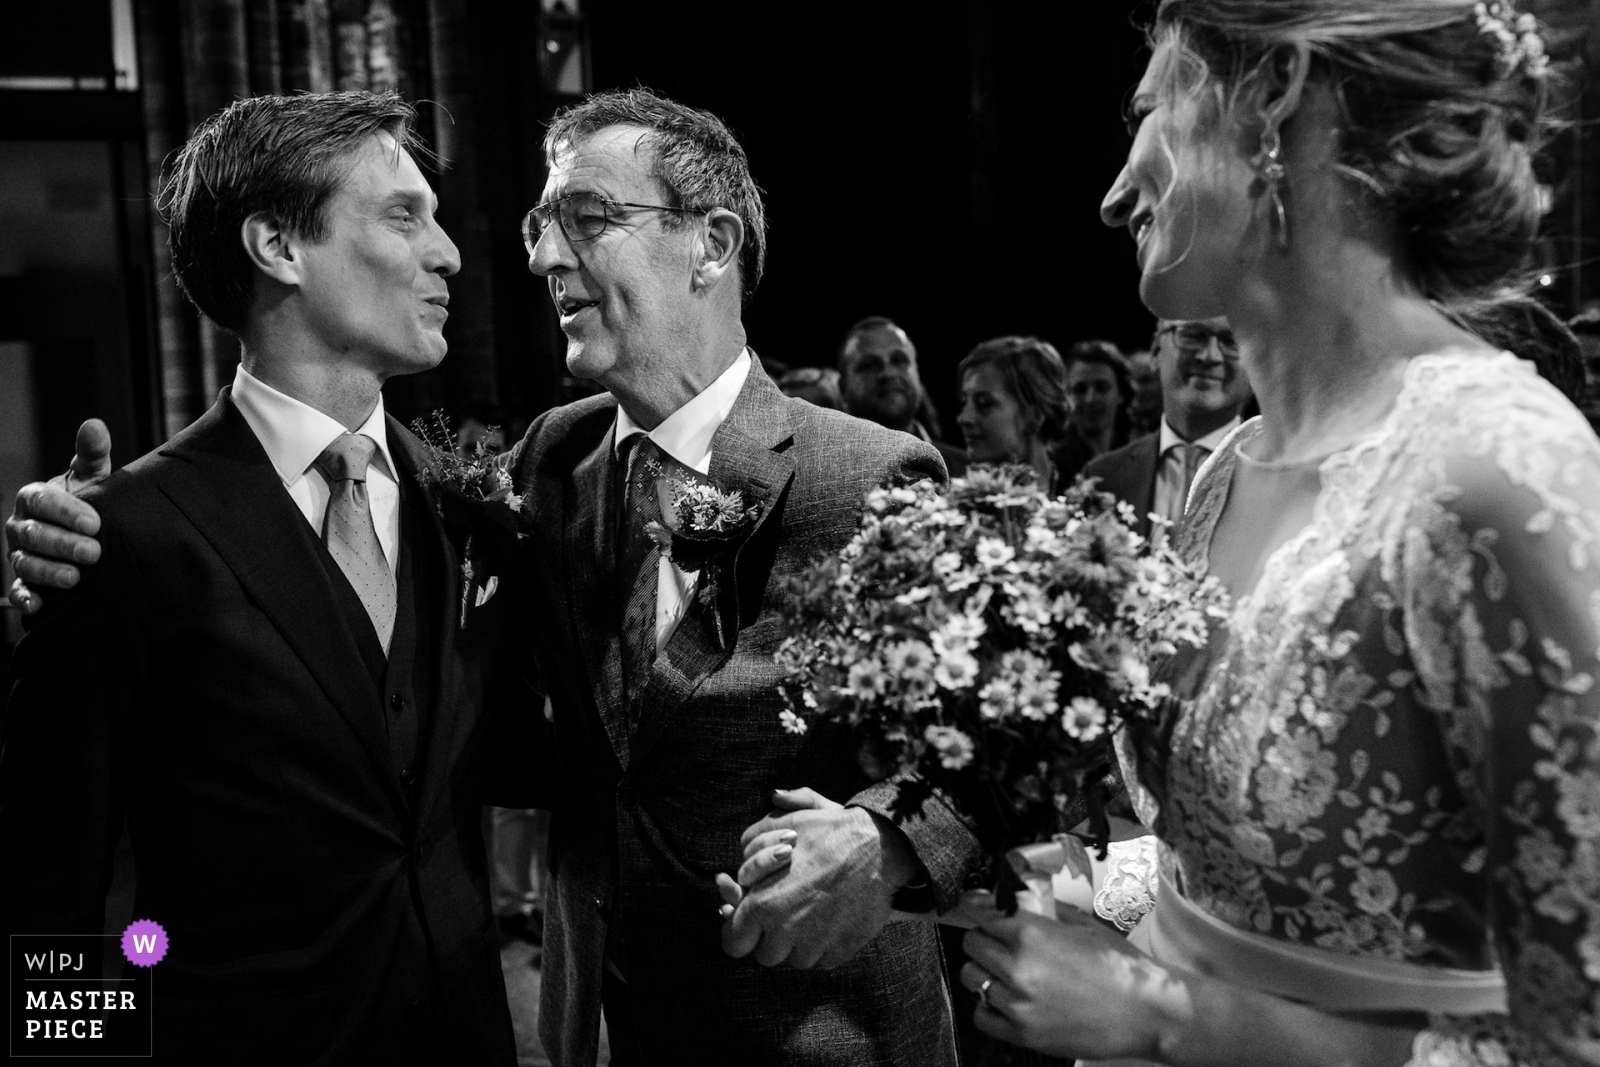 Wedding photo journalists association v6 2019